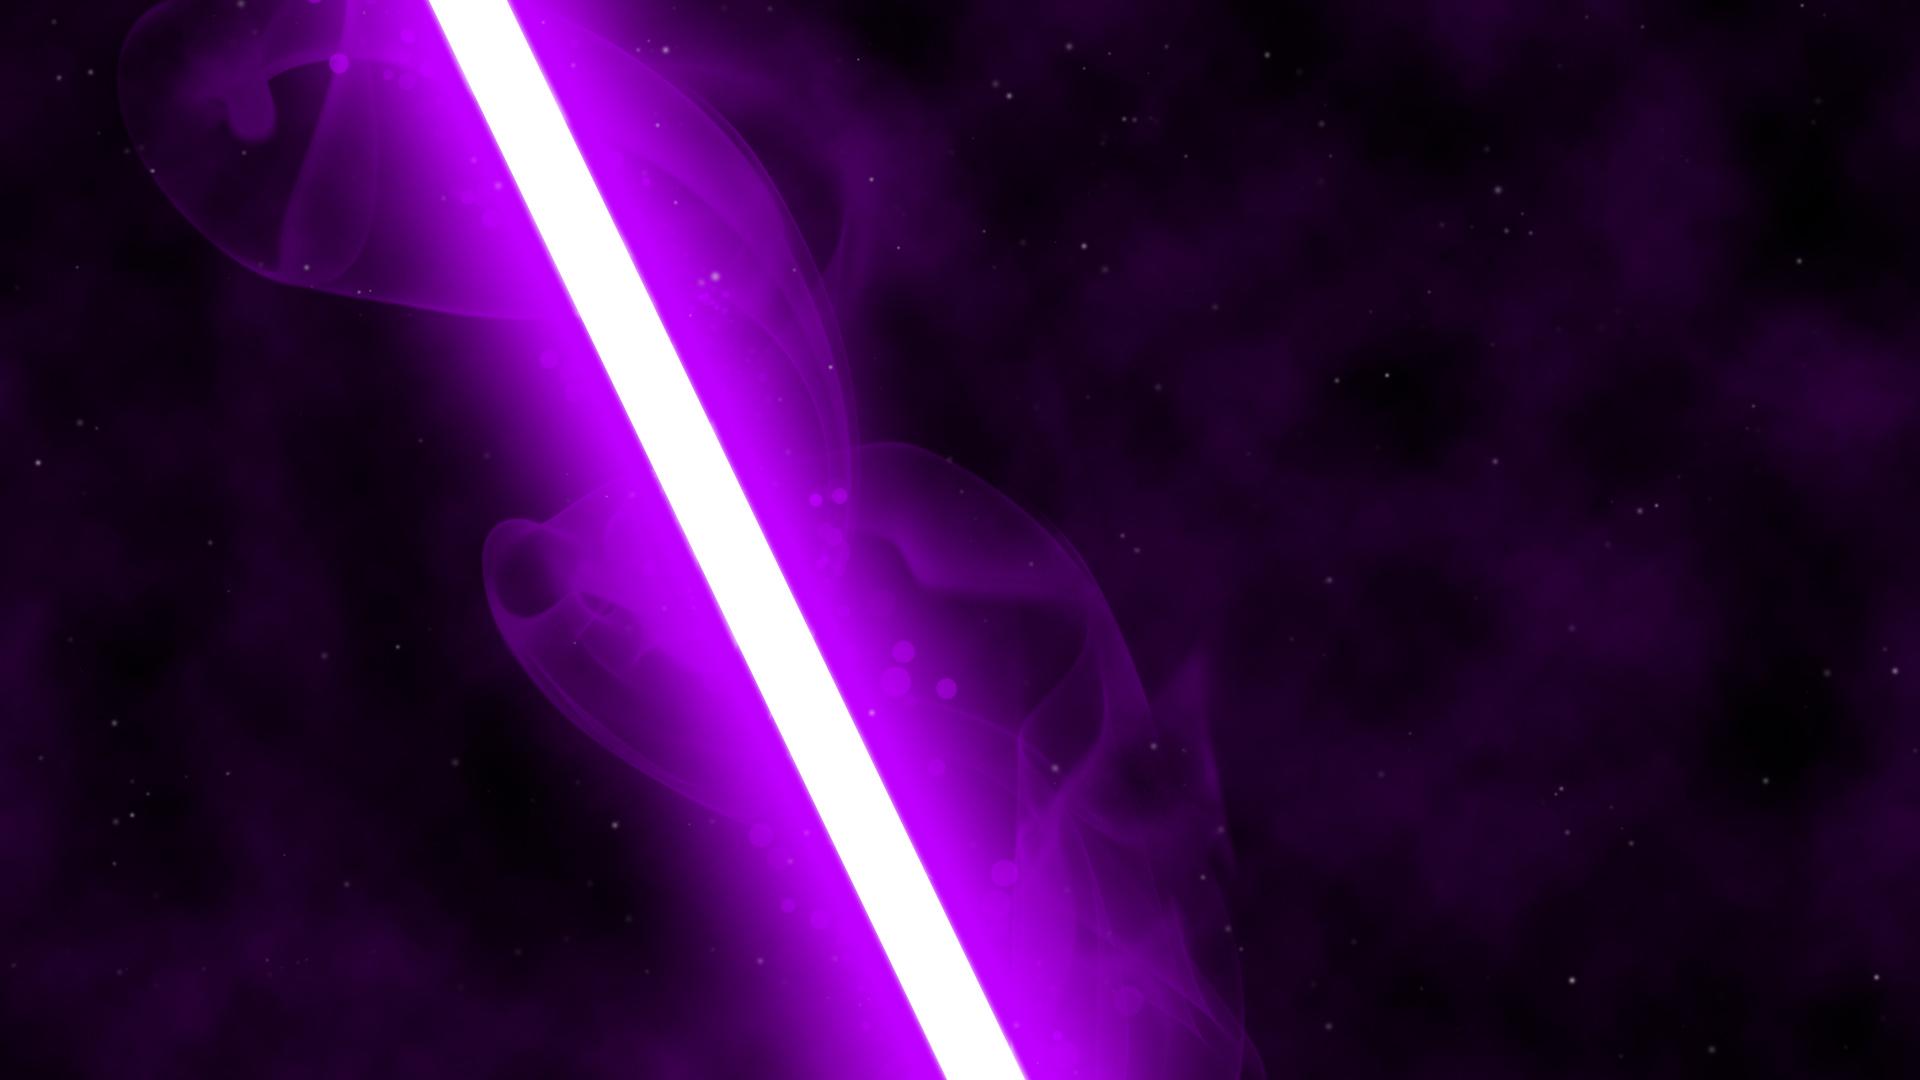 48+ Purple Lightsaber Wallpaper on WallpaperSafari